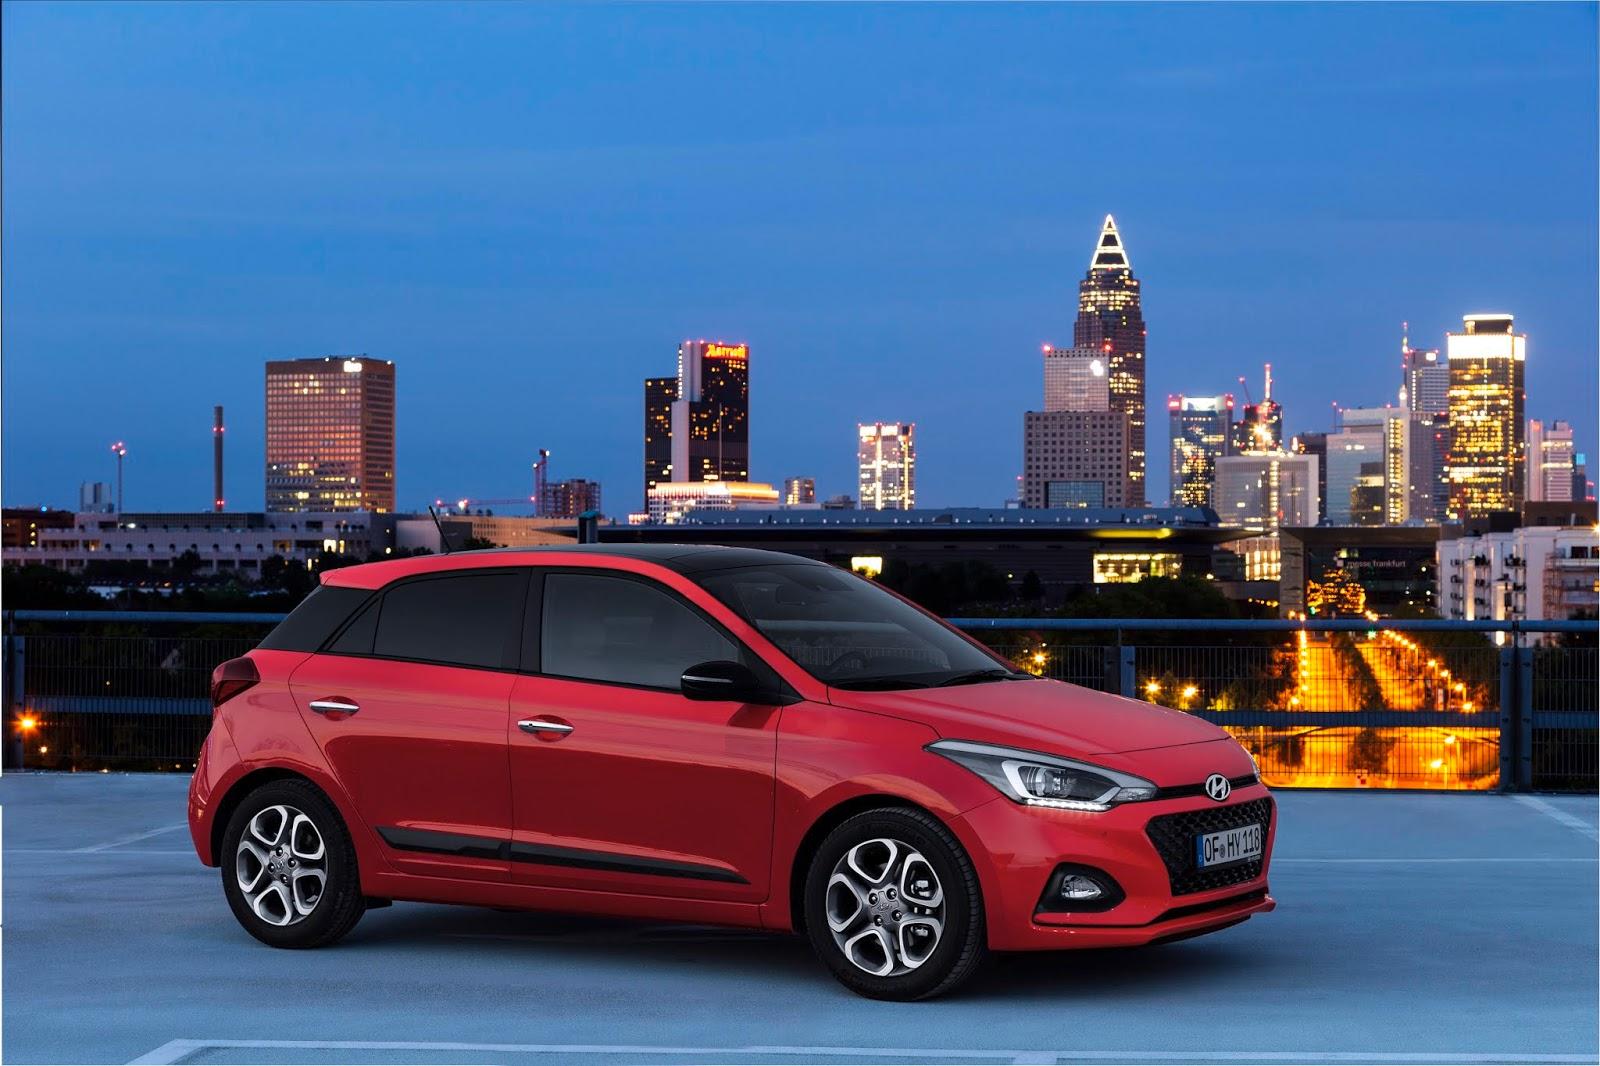 New2BHyundai2Bi202B252822529 Το Hyundai i20 δεν χαλάει ποτέ, λέει γερμανική έρευνα Hyundai, Hyundai Ελλάς, αυτοκίνητα, βλάβες, Γερμανία, Έκθεση, καινούρια